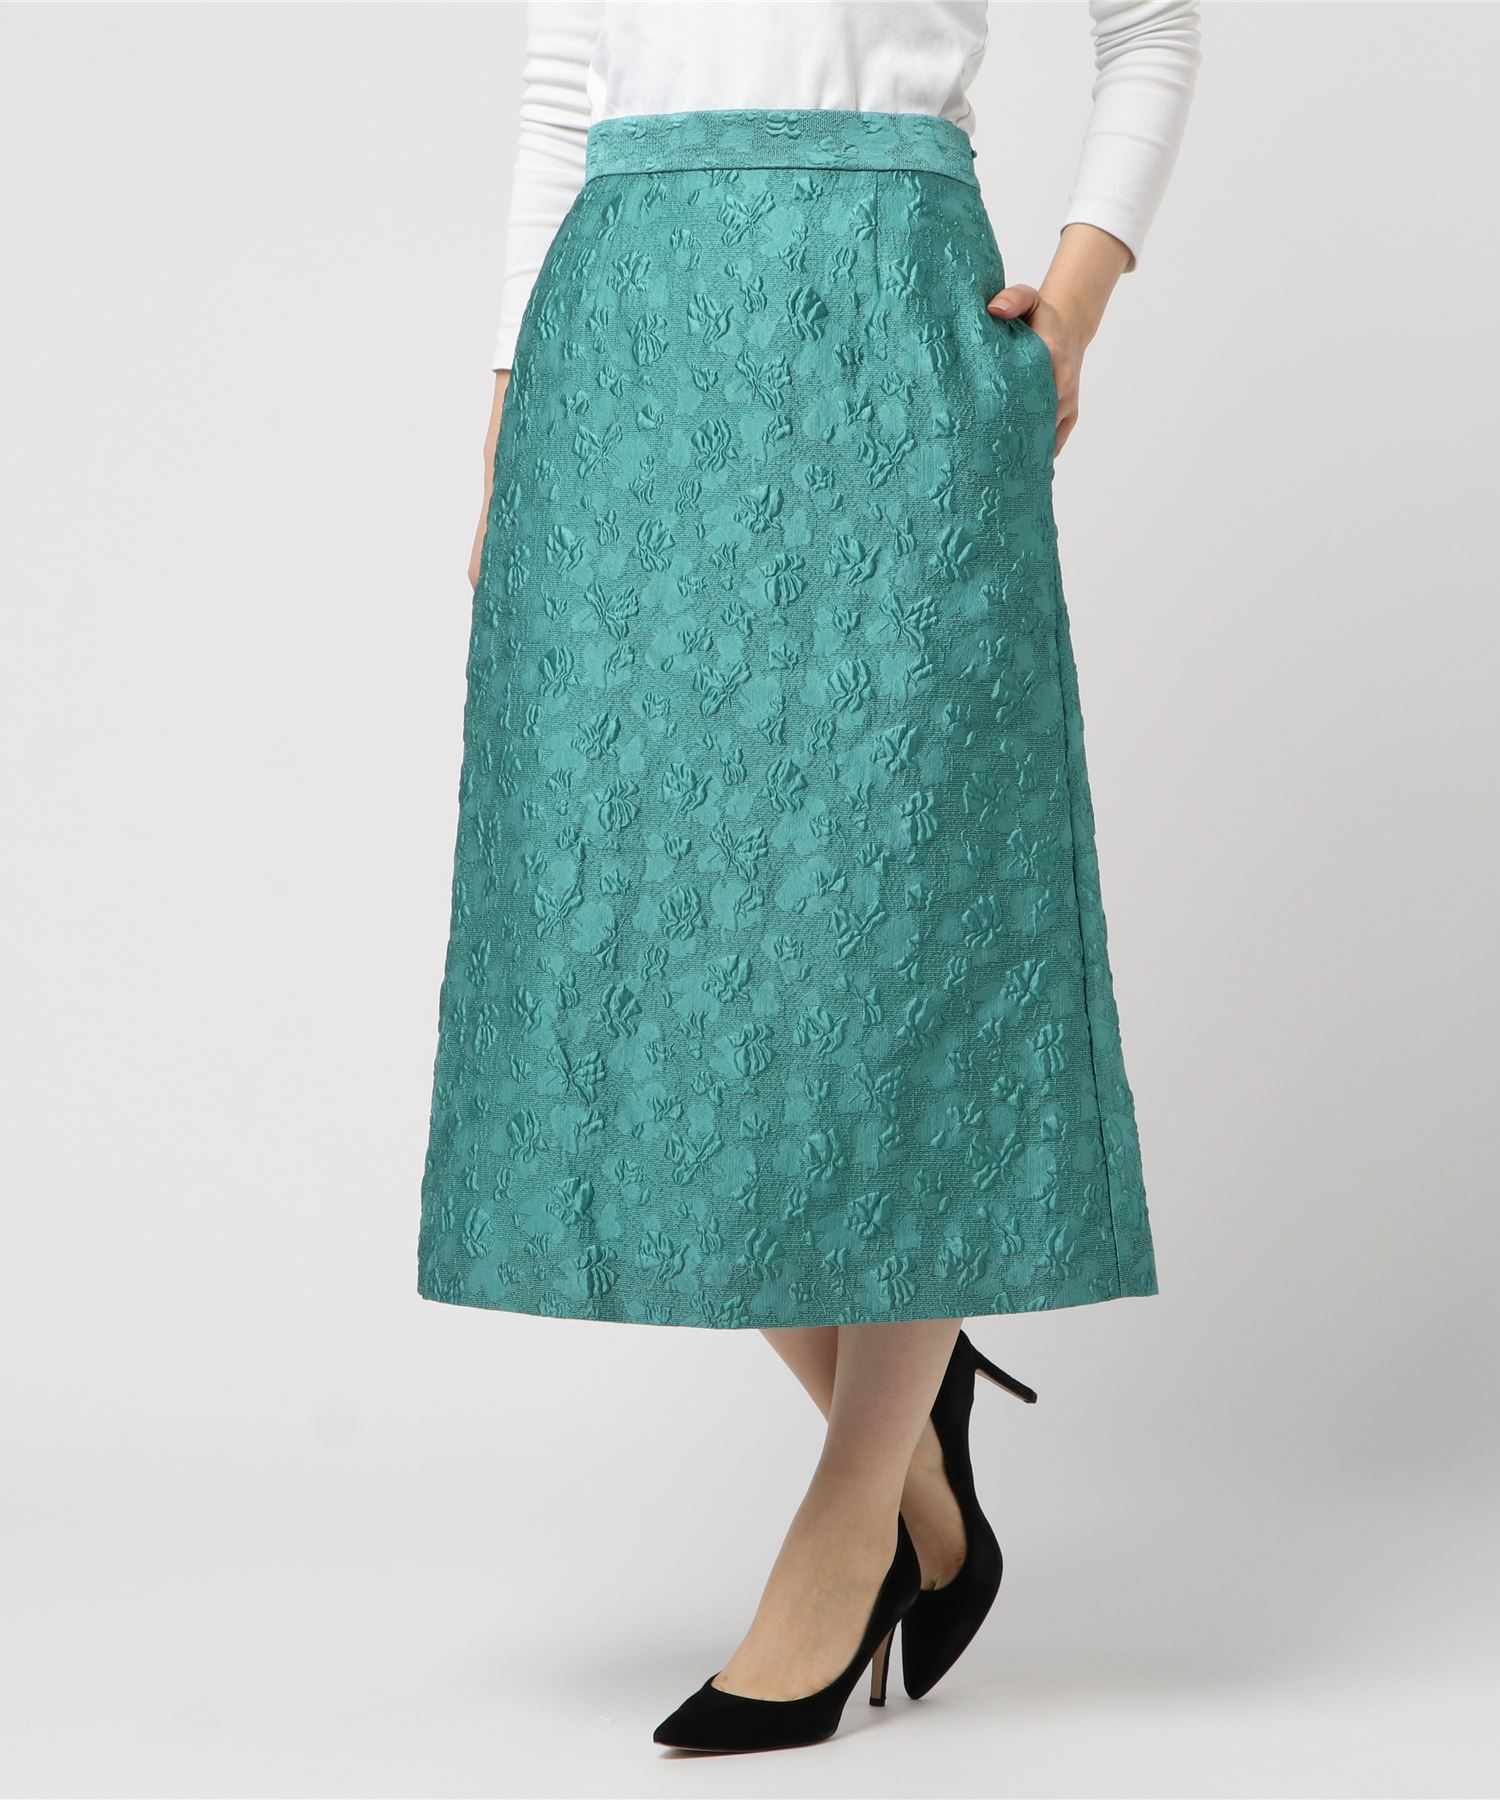 RHIE リエ / GERGIA A-LINE SKIRT スカート